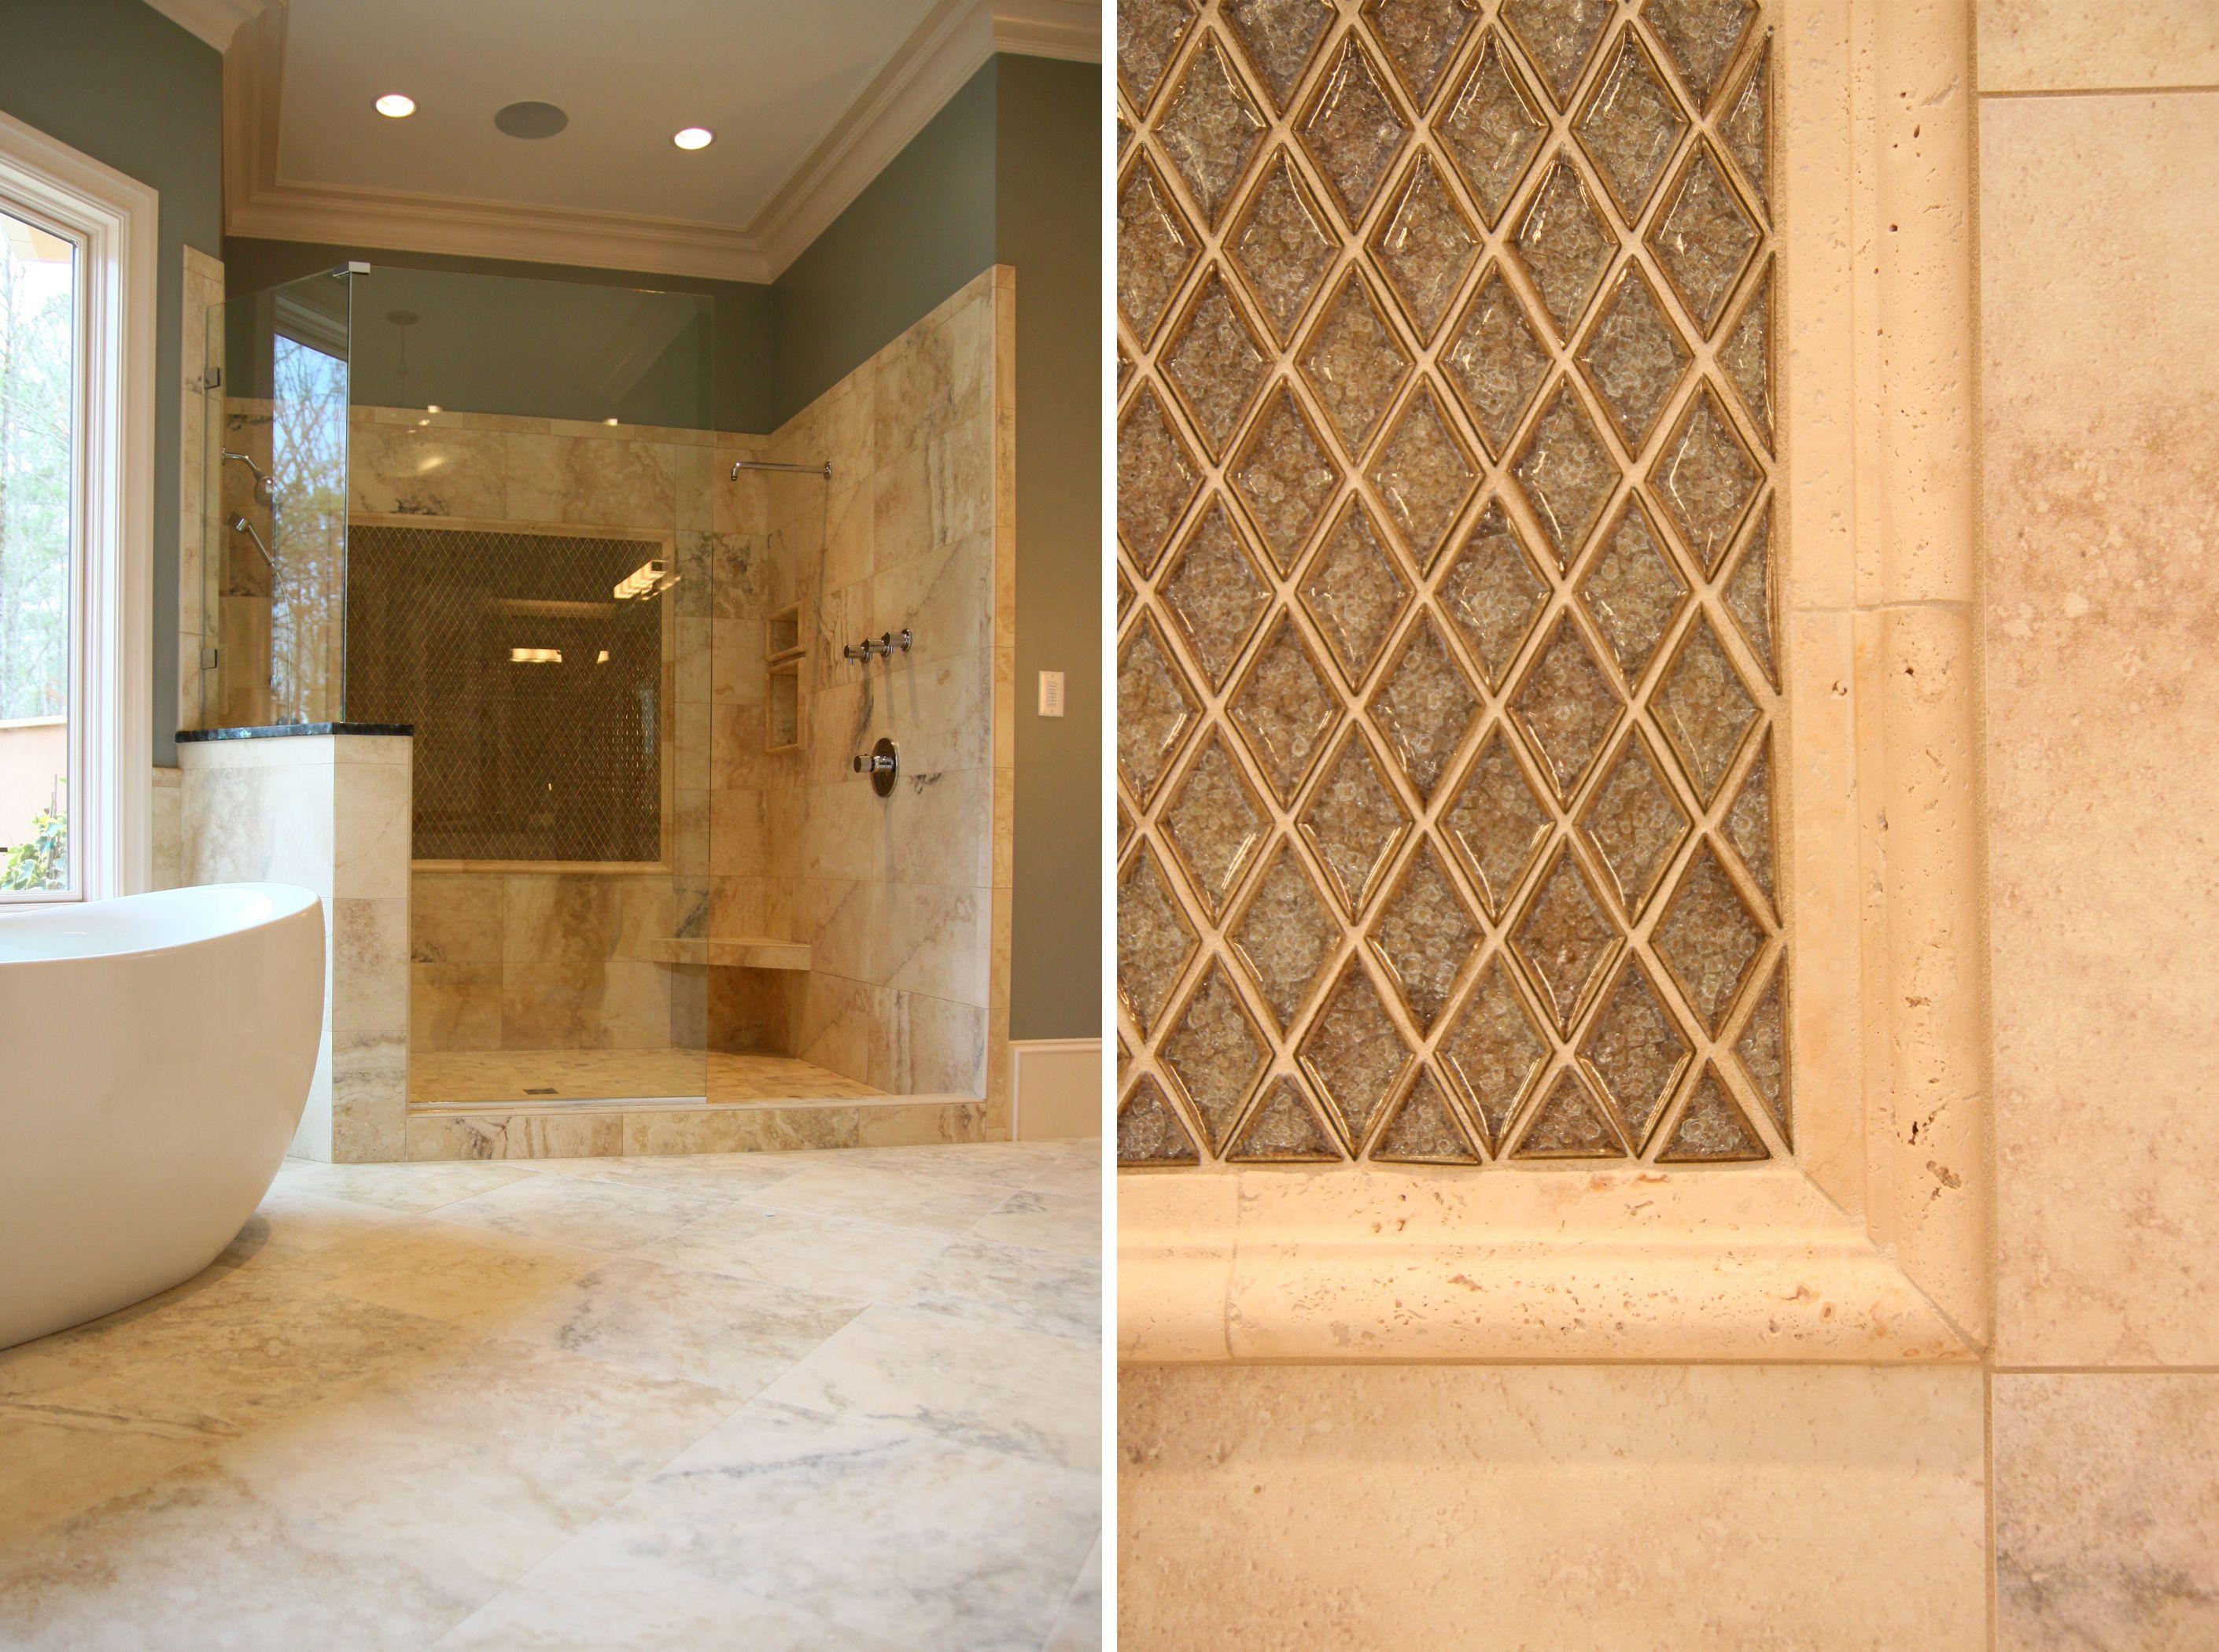 Bathroom Tubshower Tile Lines Blog Master Bathroom Tub And - Home depot bathroom tubs for bathroom decor ideas